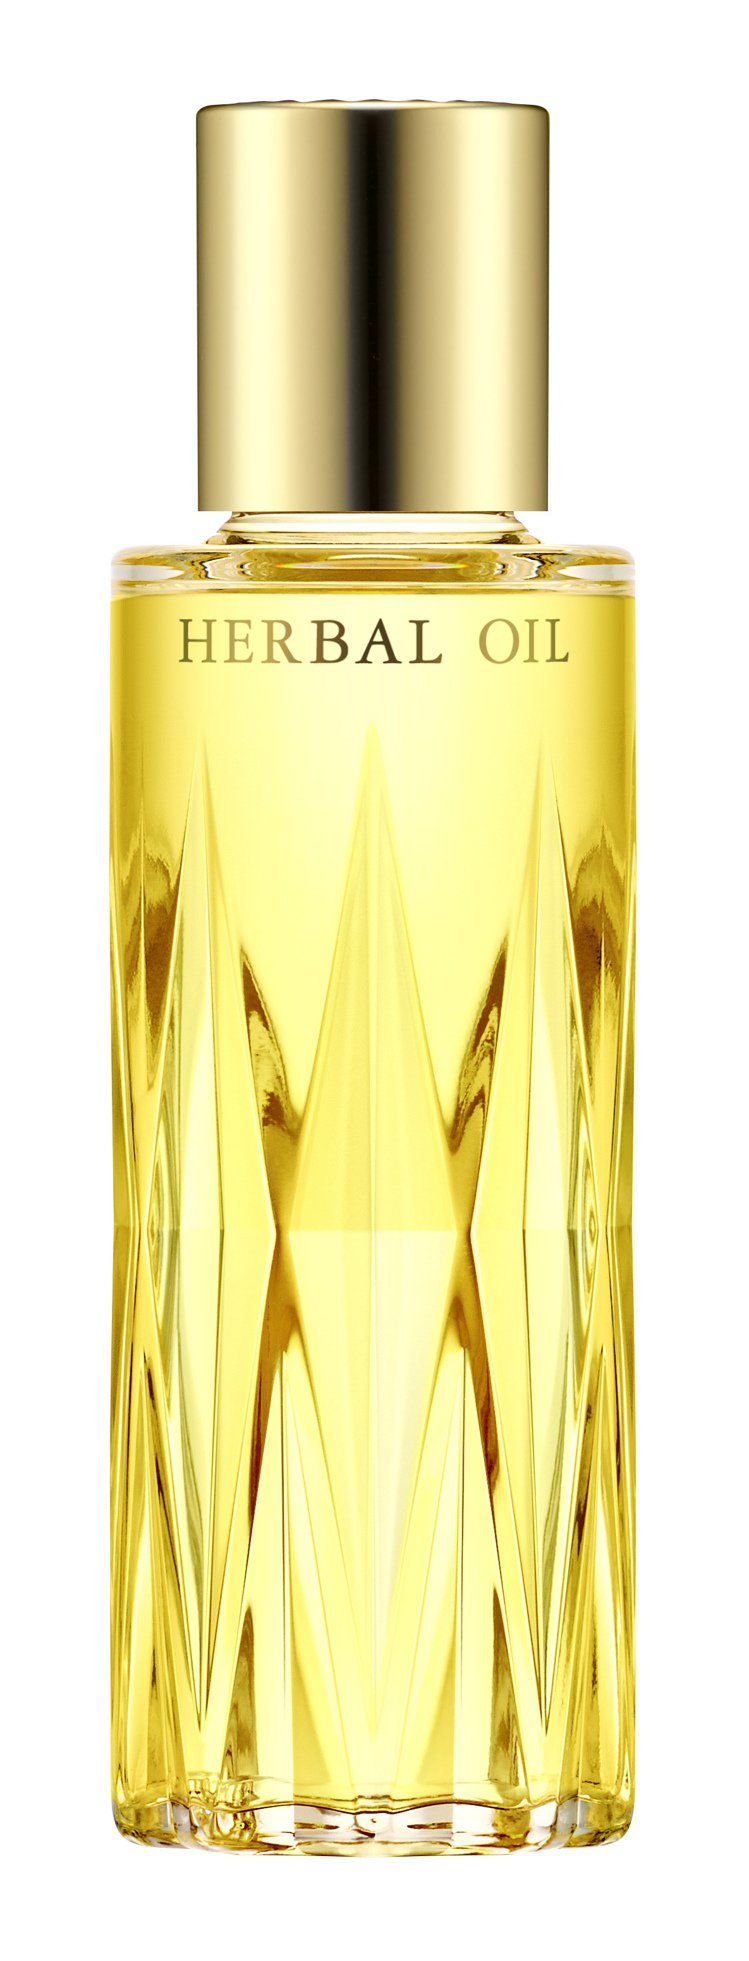 ALBION黃金全效修護精華油/40ml/1,650元。圖/ALBION提供